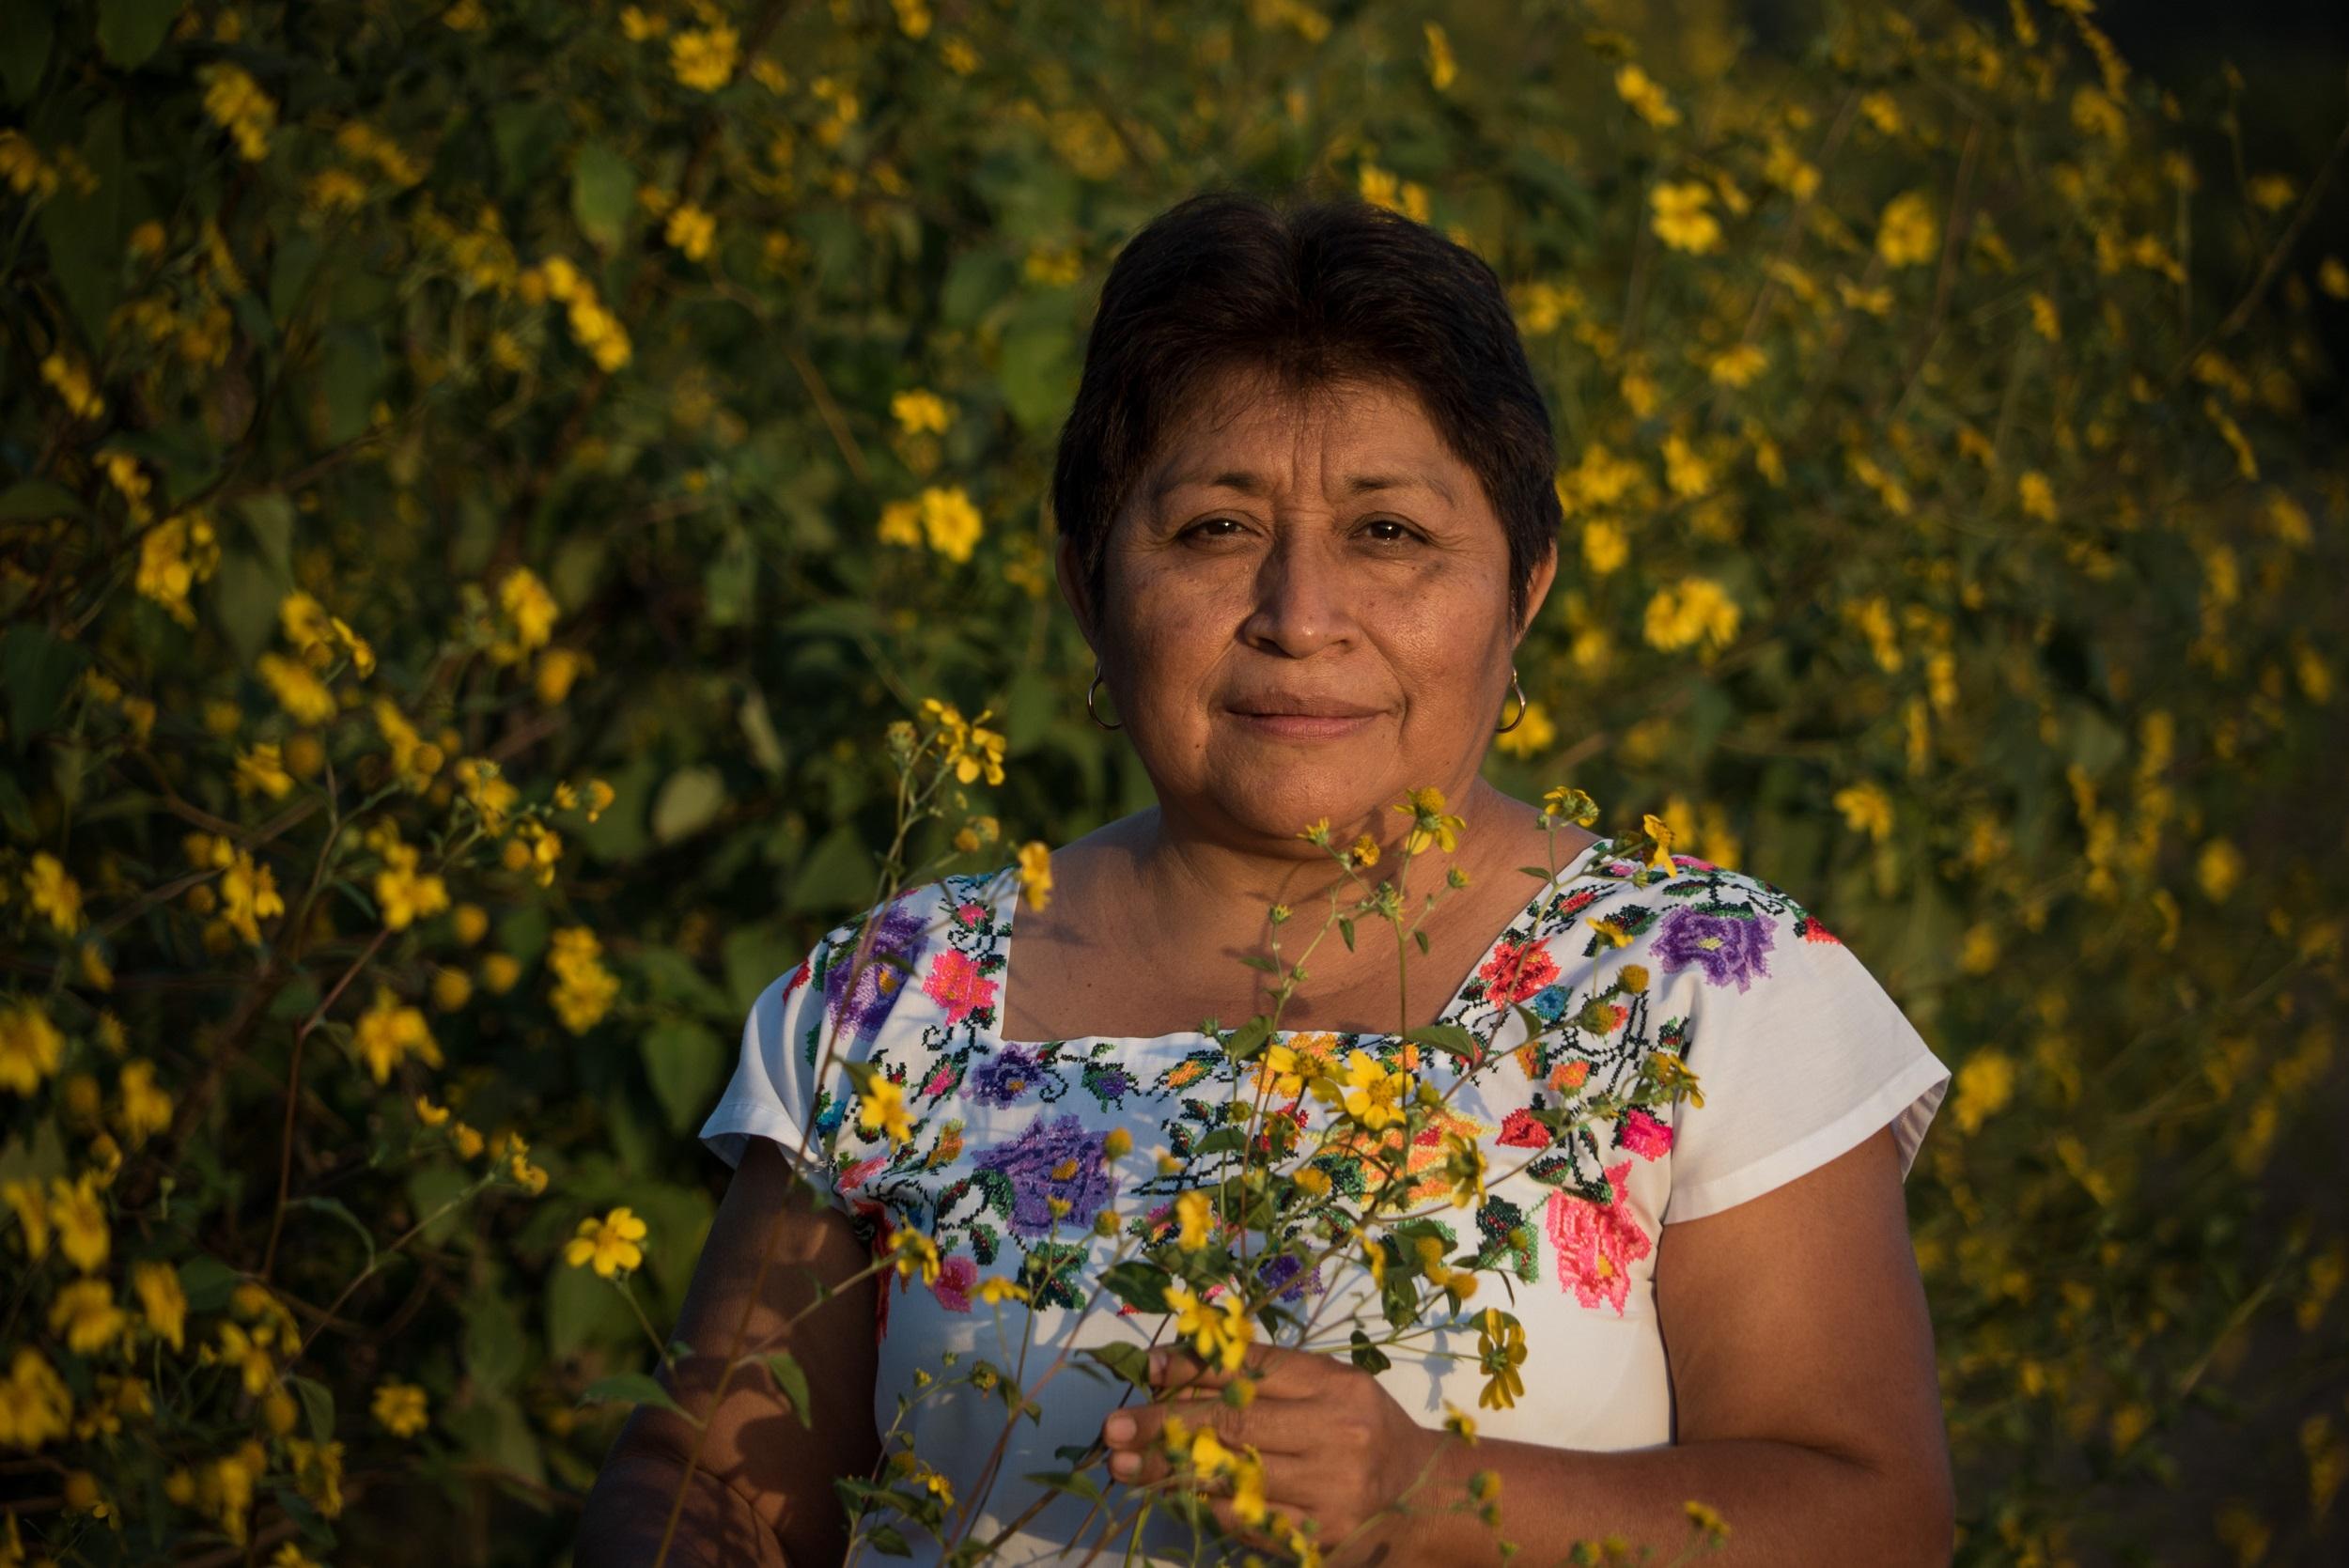 Leydy Pech, the 2020 Goldman Environmental Prize winner for North America. Image courtesy of Goldman Environmental Prize.